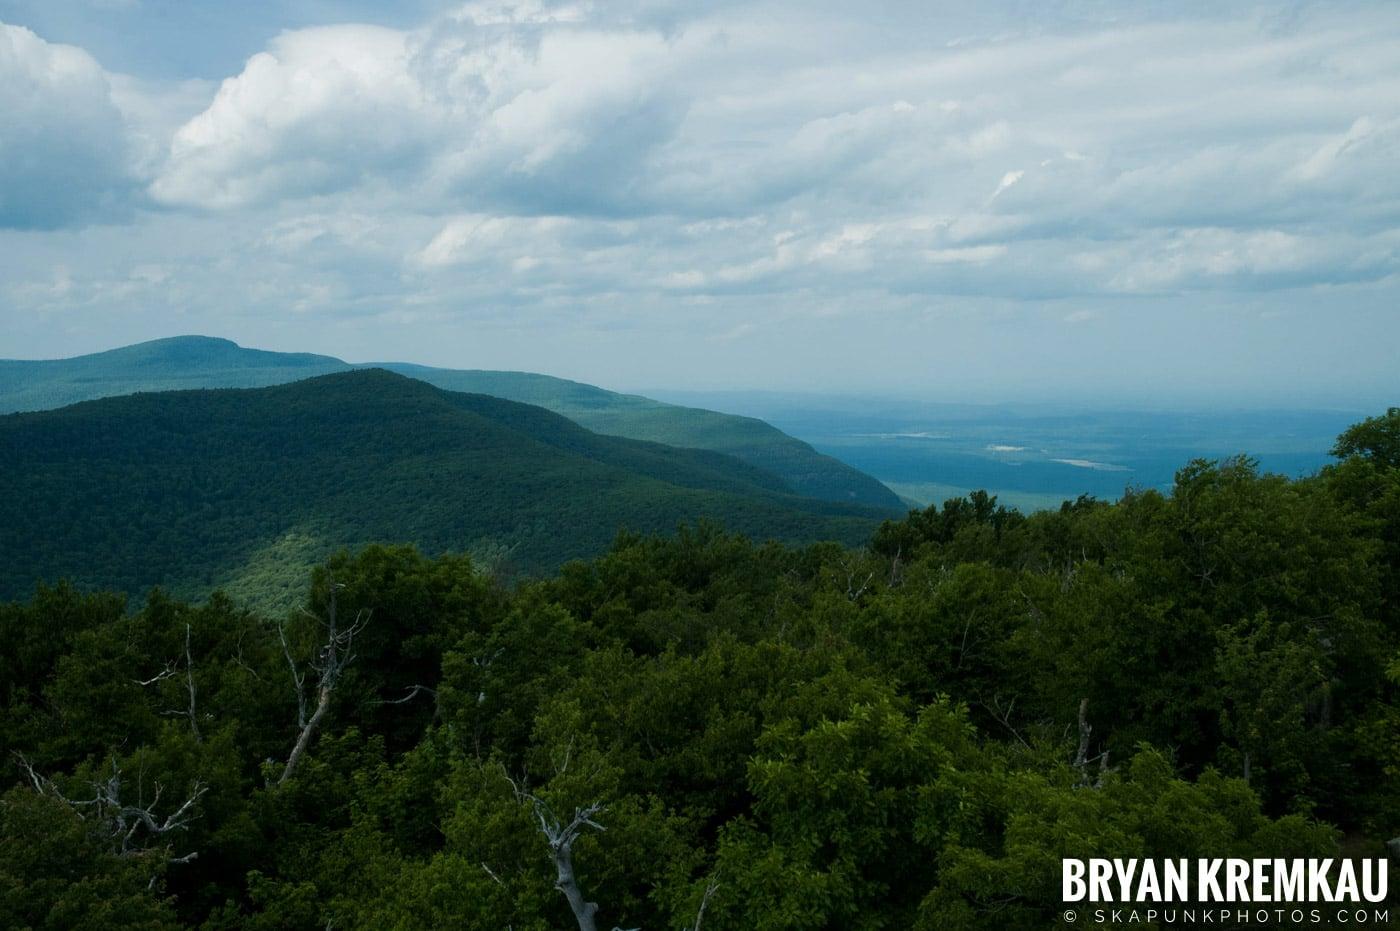 Catskills Overlook Mountain @ Woodstock, NY - 6.24.07 (6)